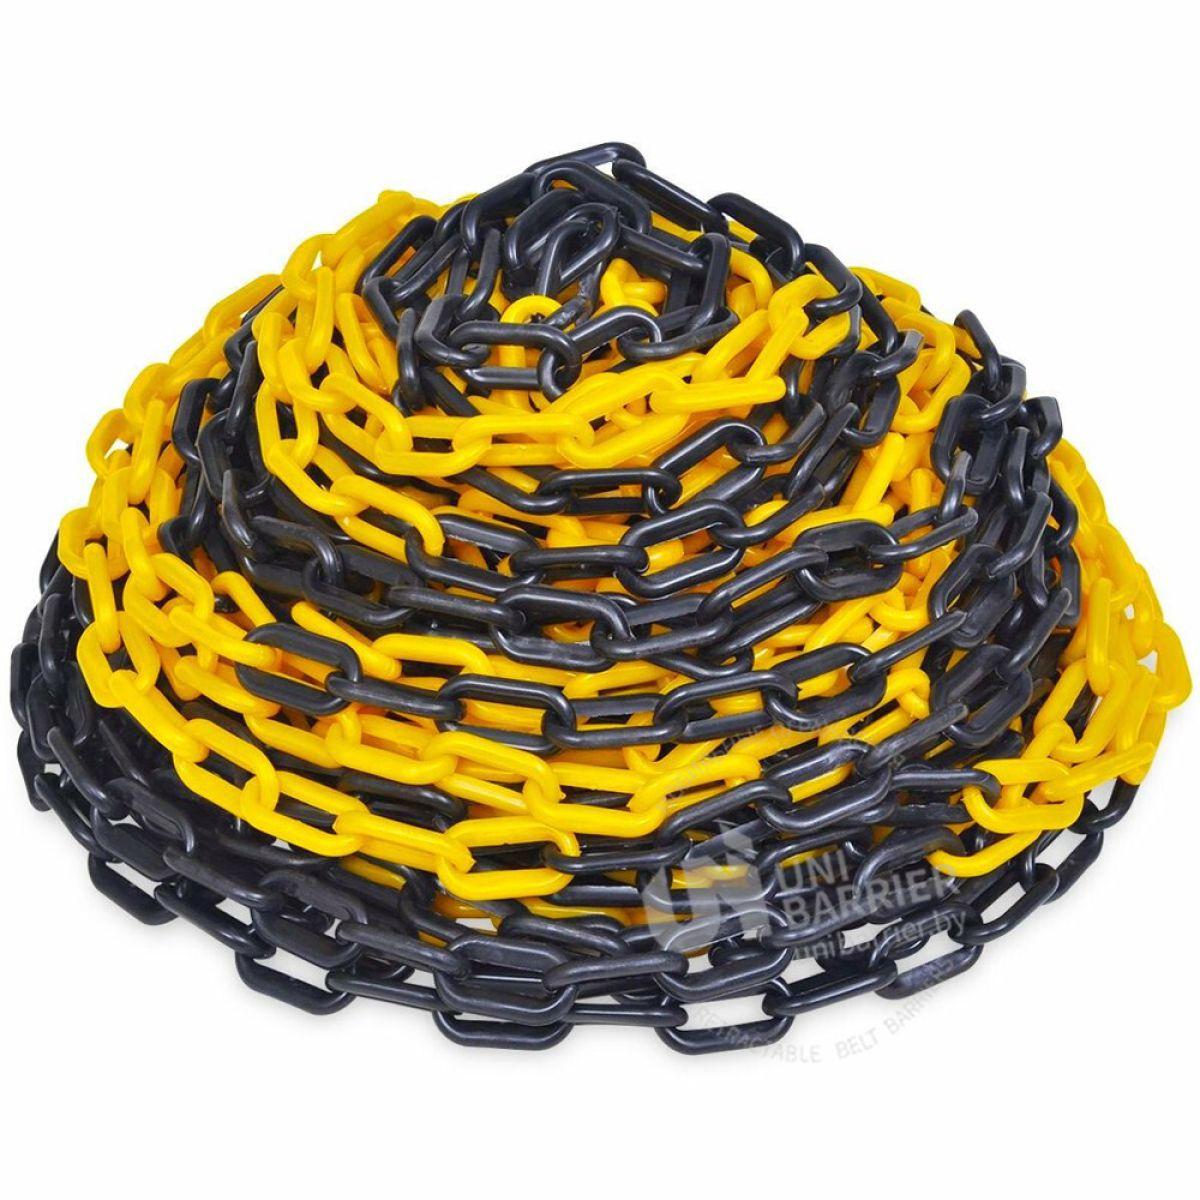 9962 Пластиковая цепочка 8 мм желтая-черная 50 м